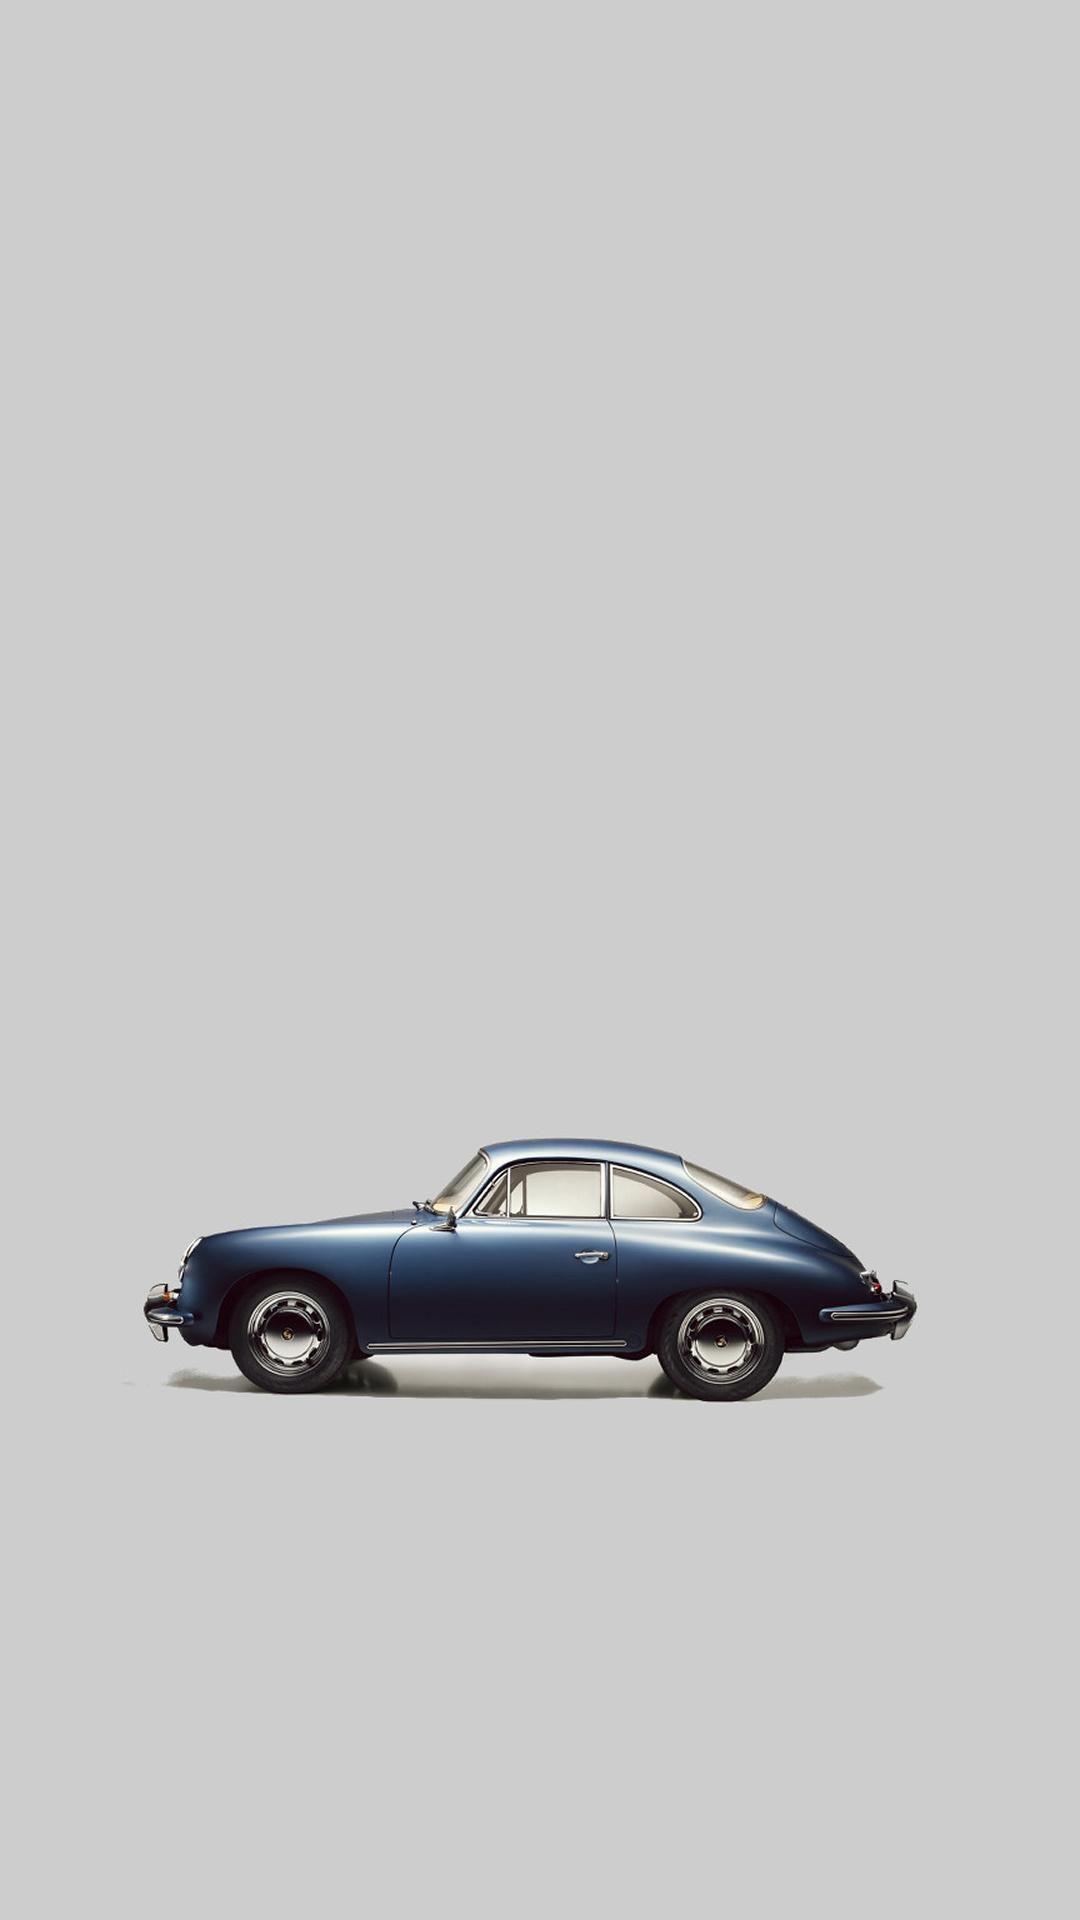 Minimalist Cute Image In 2020 Car Iphone Wallpaper Porsche Classic Porsche